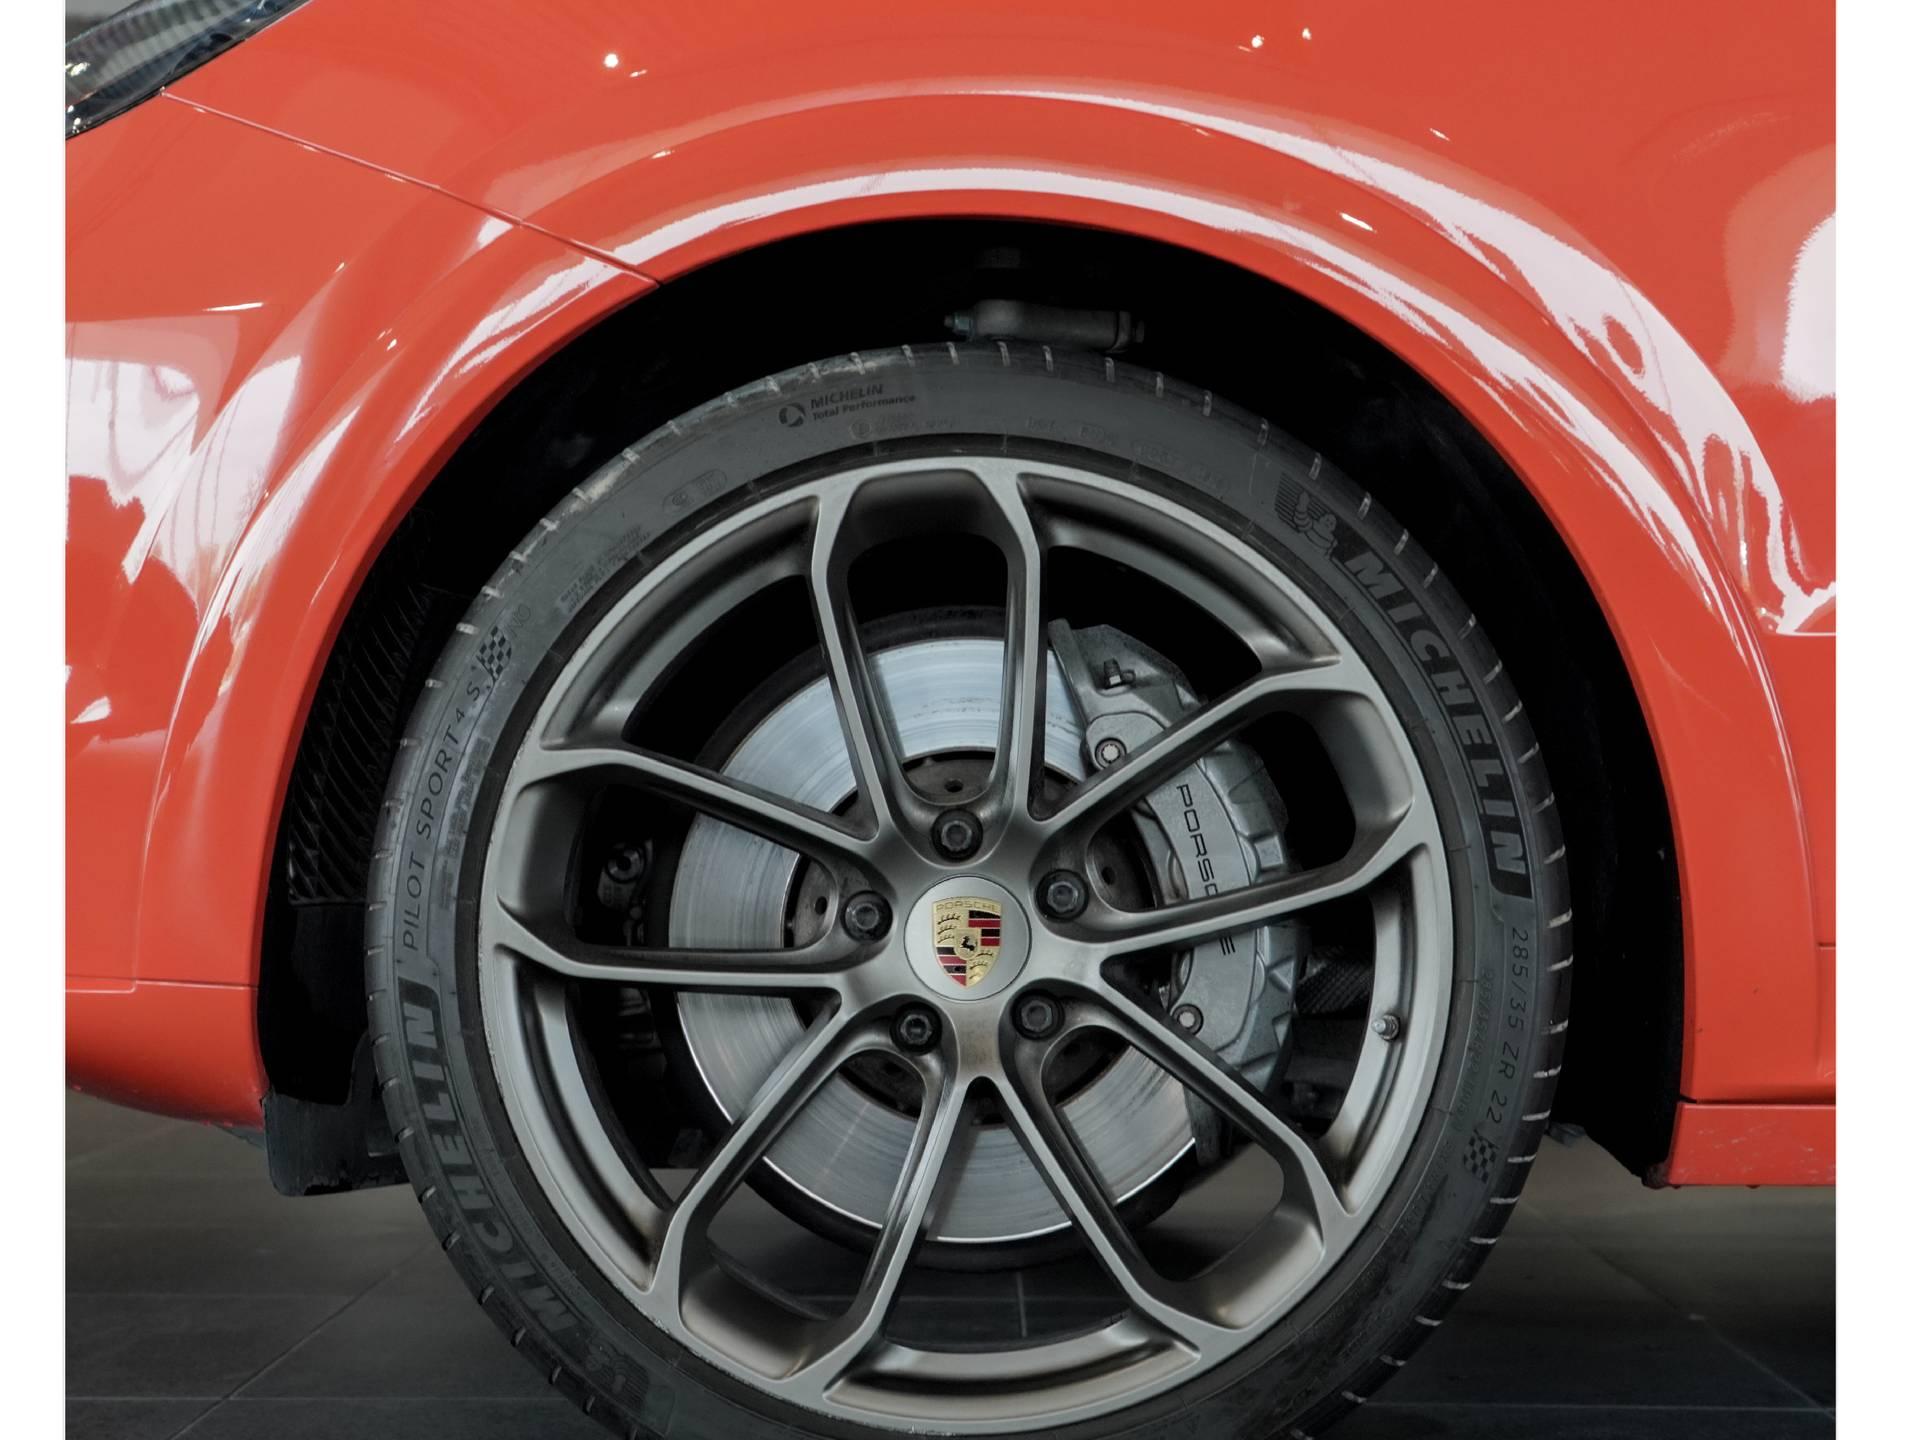 2020 Porsche Cayenne S Coupé – 4